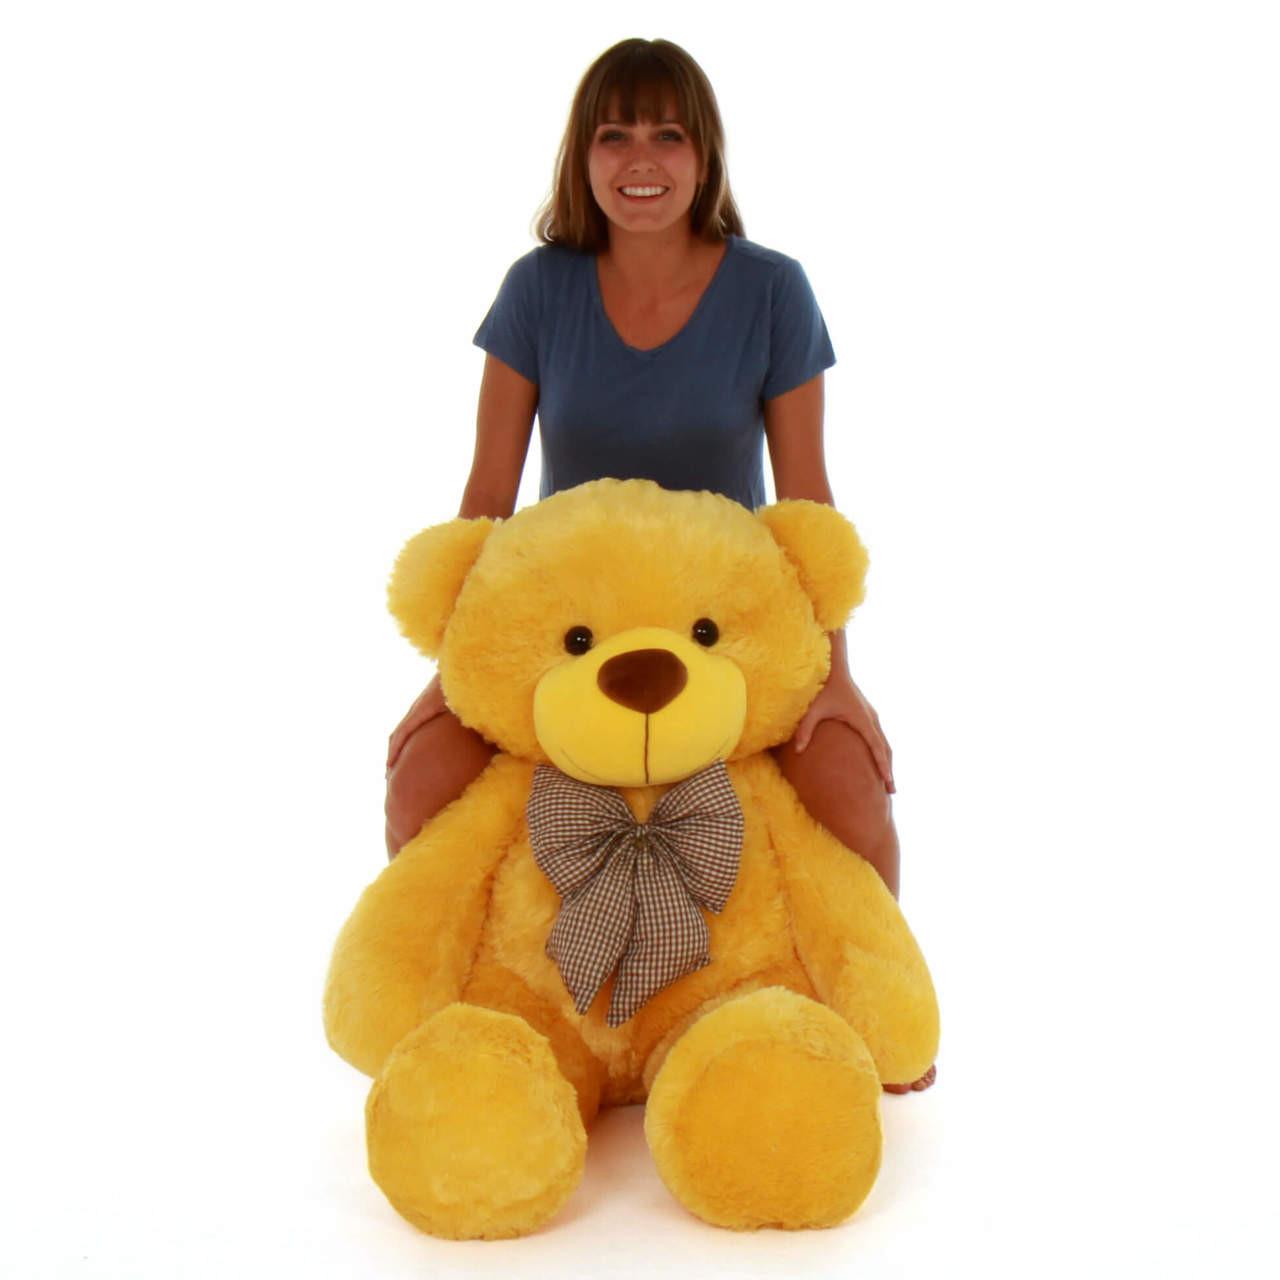 48in Life Size biggest Yellow Teddy Bear Cuddles Giant Teddy